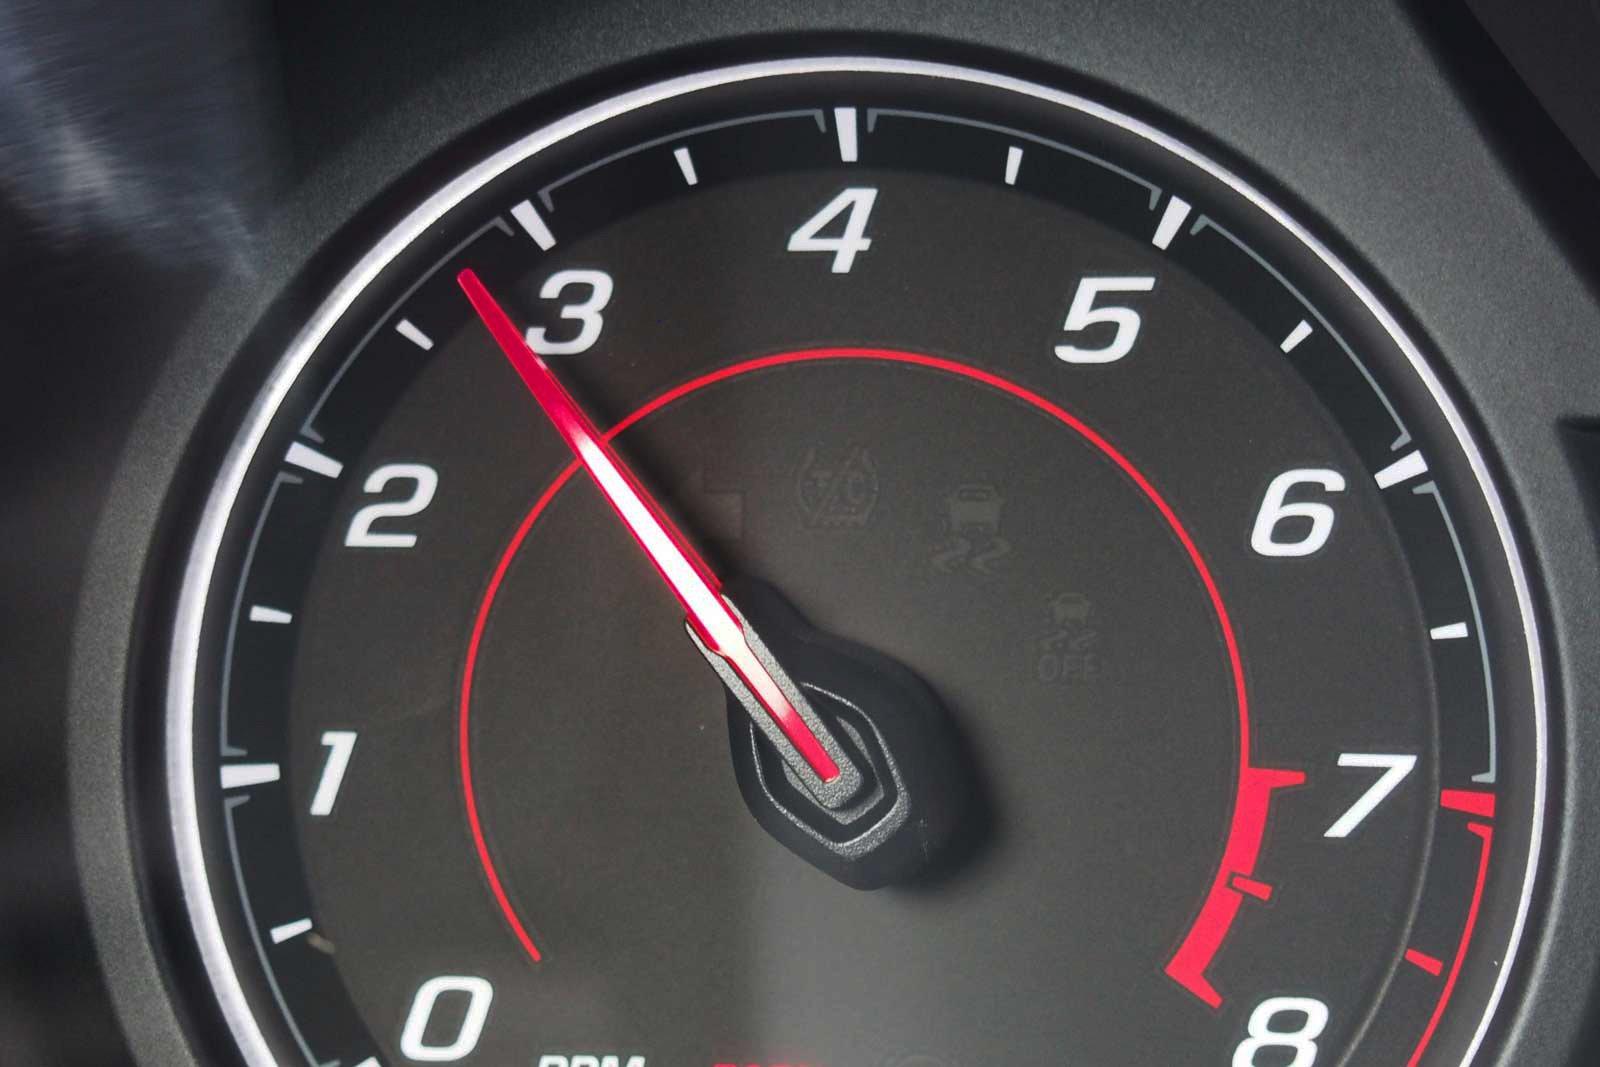 2016-Chevrolet-Camaro-1LT-Tachometer-01